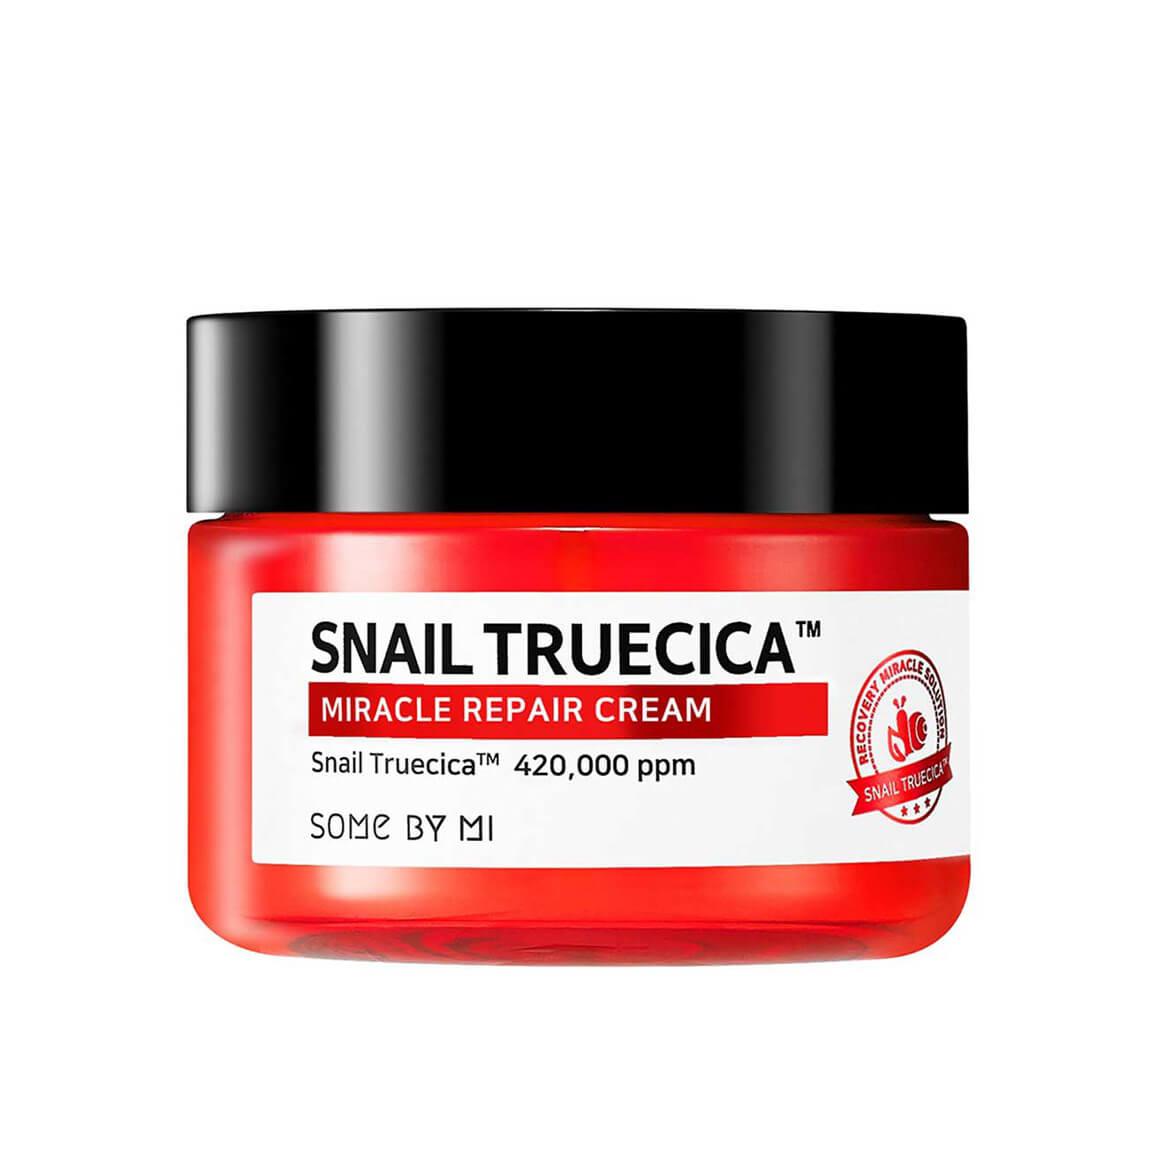 Some By Mi Snail Truecica Miracle Repair Cream 60g